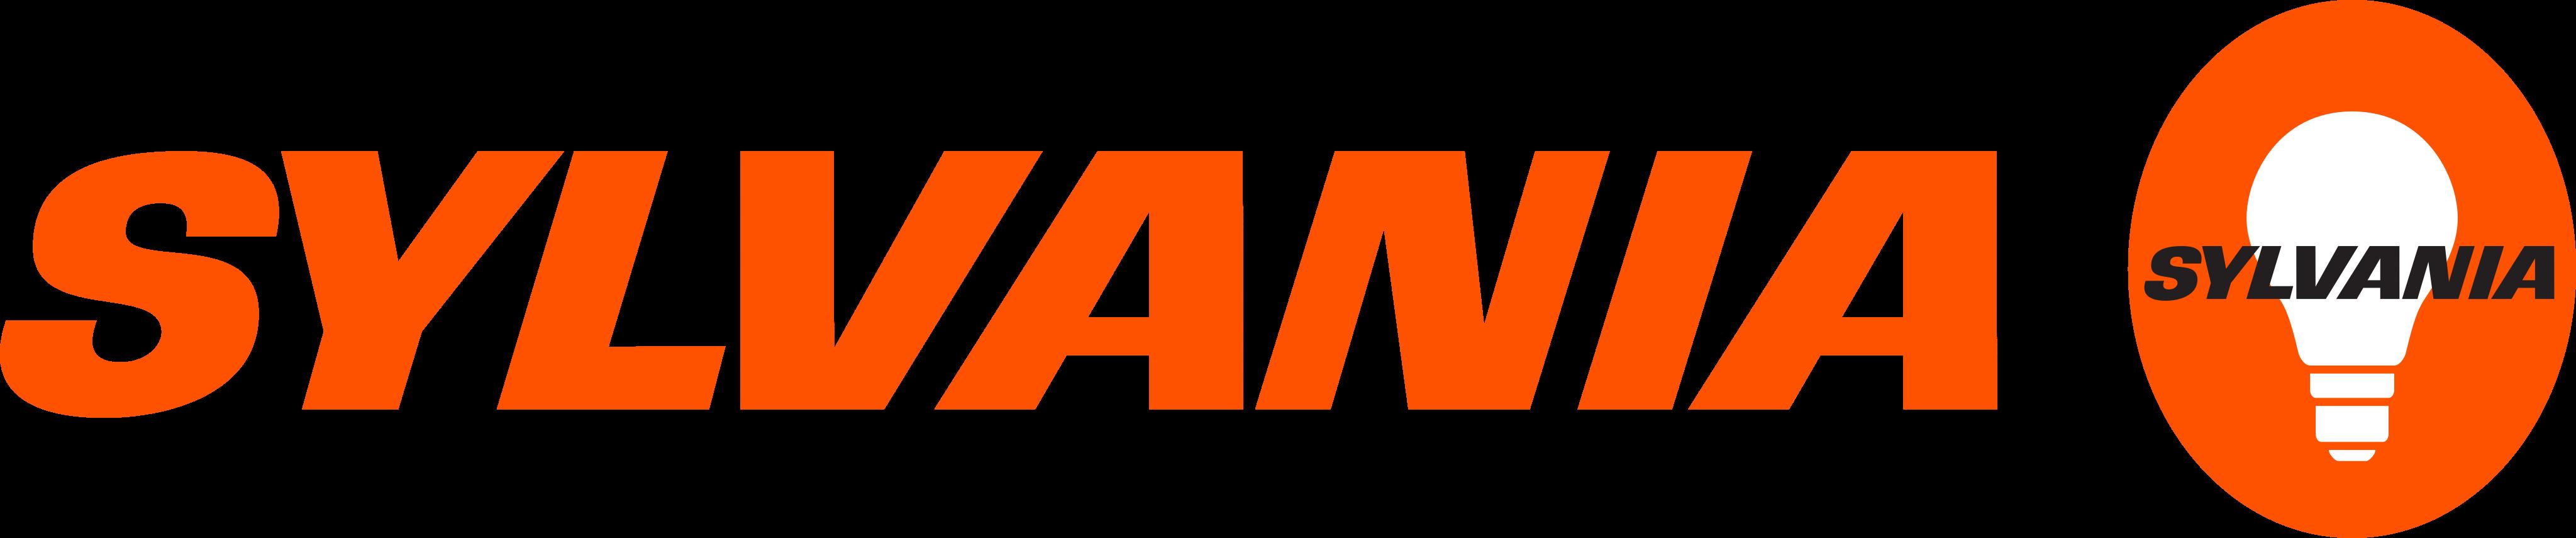 Sylvania Lighting Logo.